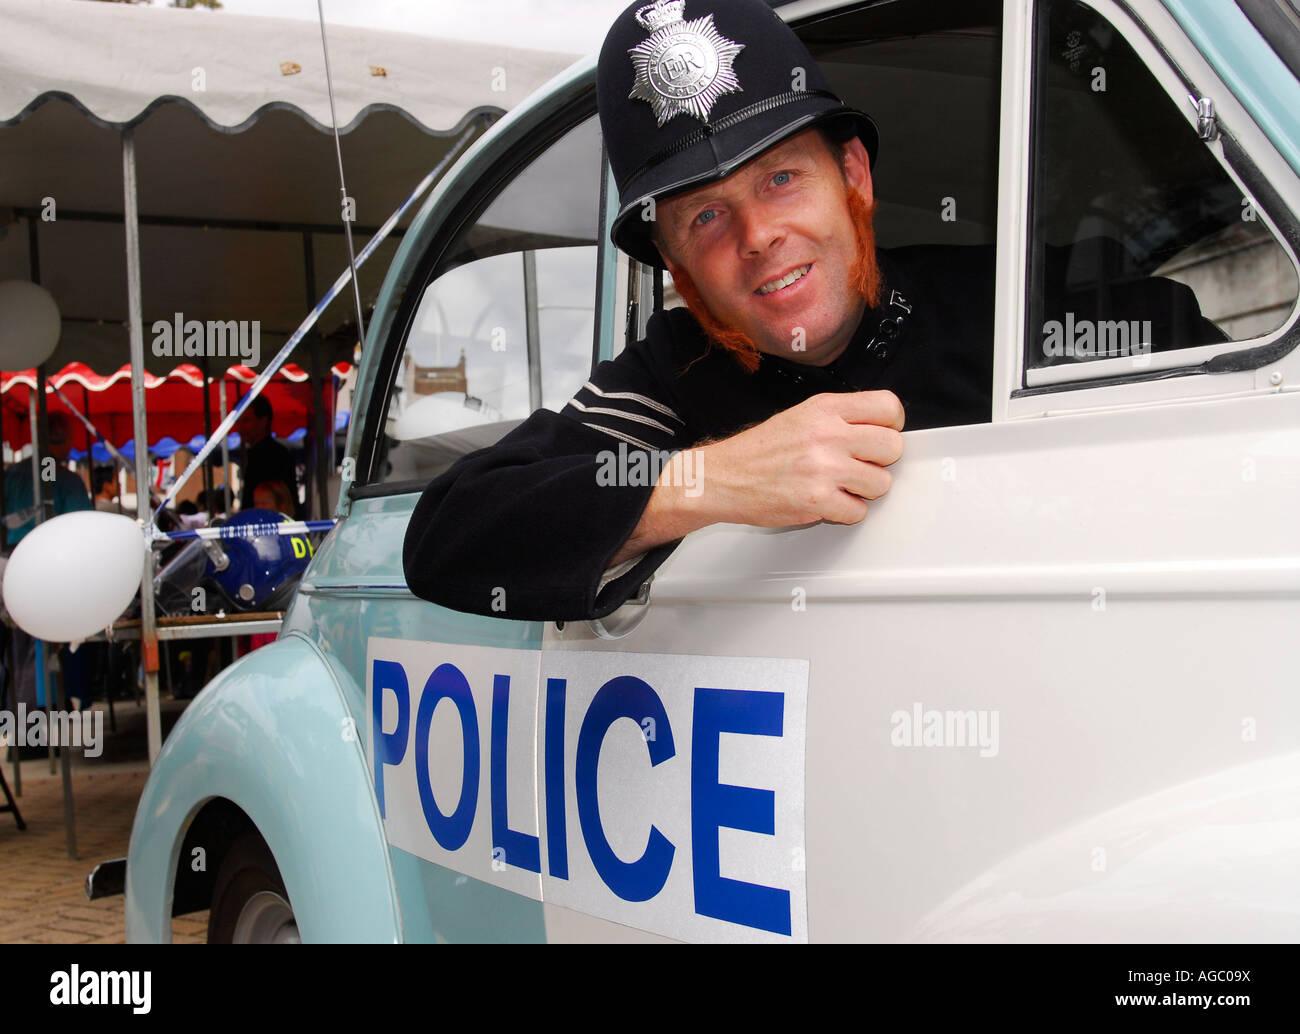 Police Officer in retrospective uniform and patrol car at Kingston Carnival 2007, Kingston, Surrey, UK. - Stock Image